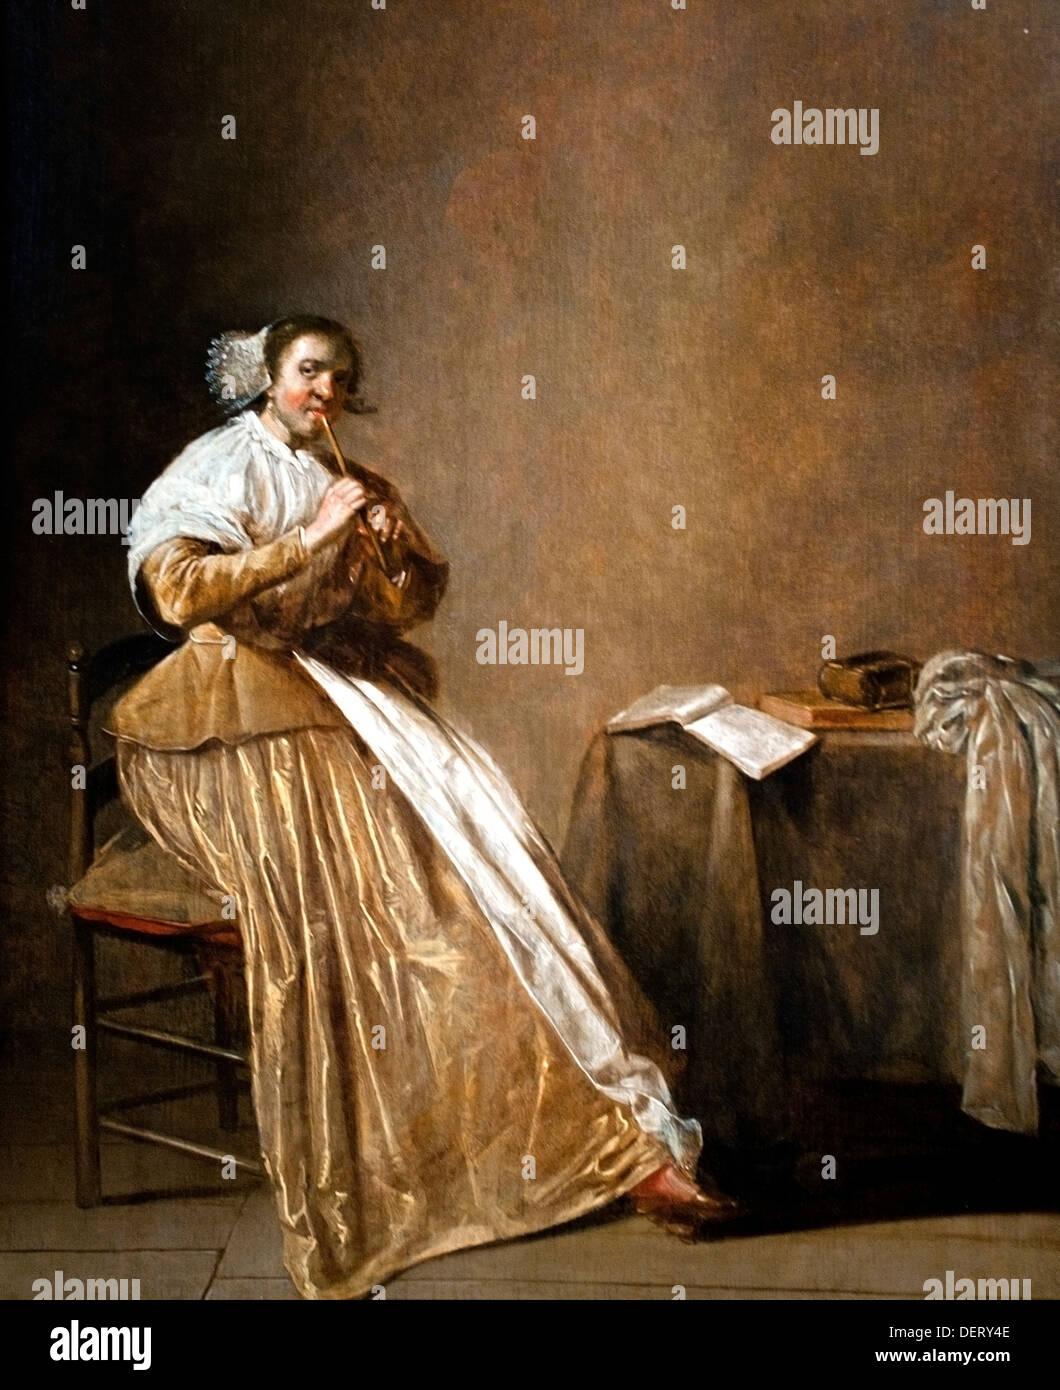 A woman playing the flute 1630  Dirck Hals 1591-1656 Dutch Netherlands - Stock Image